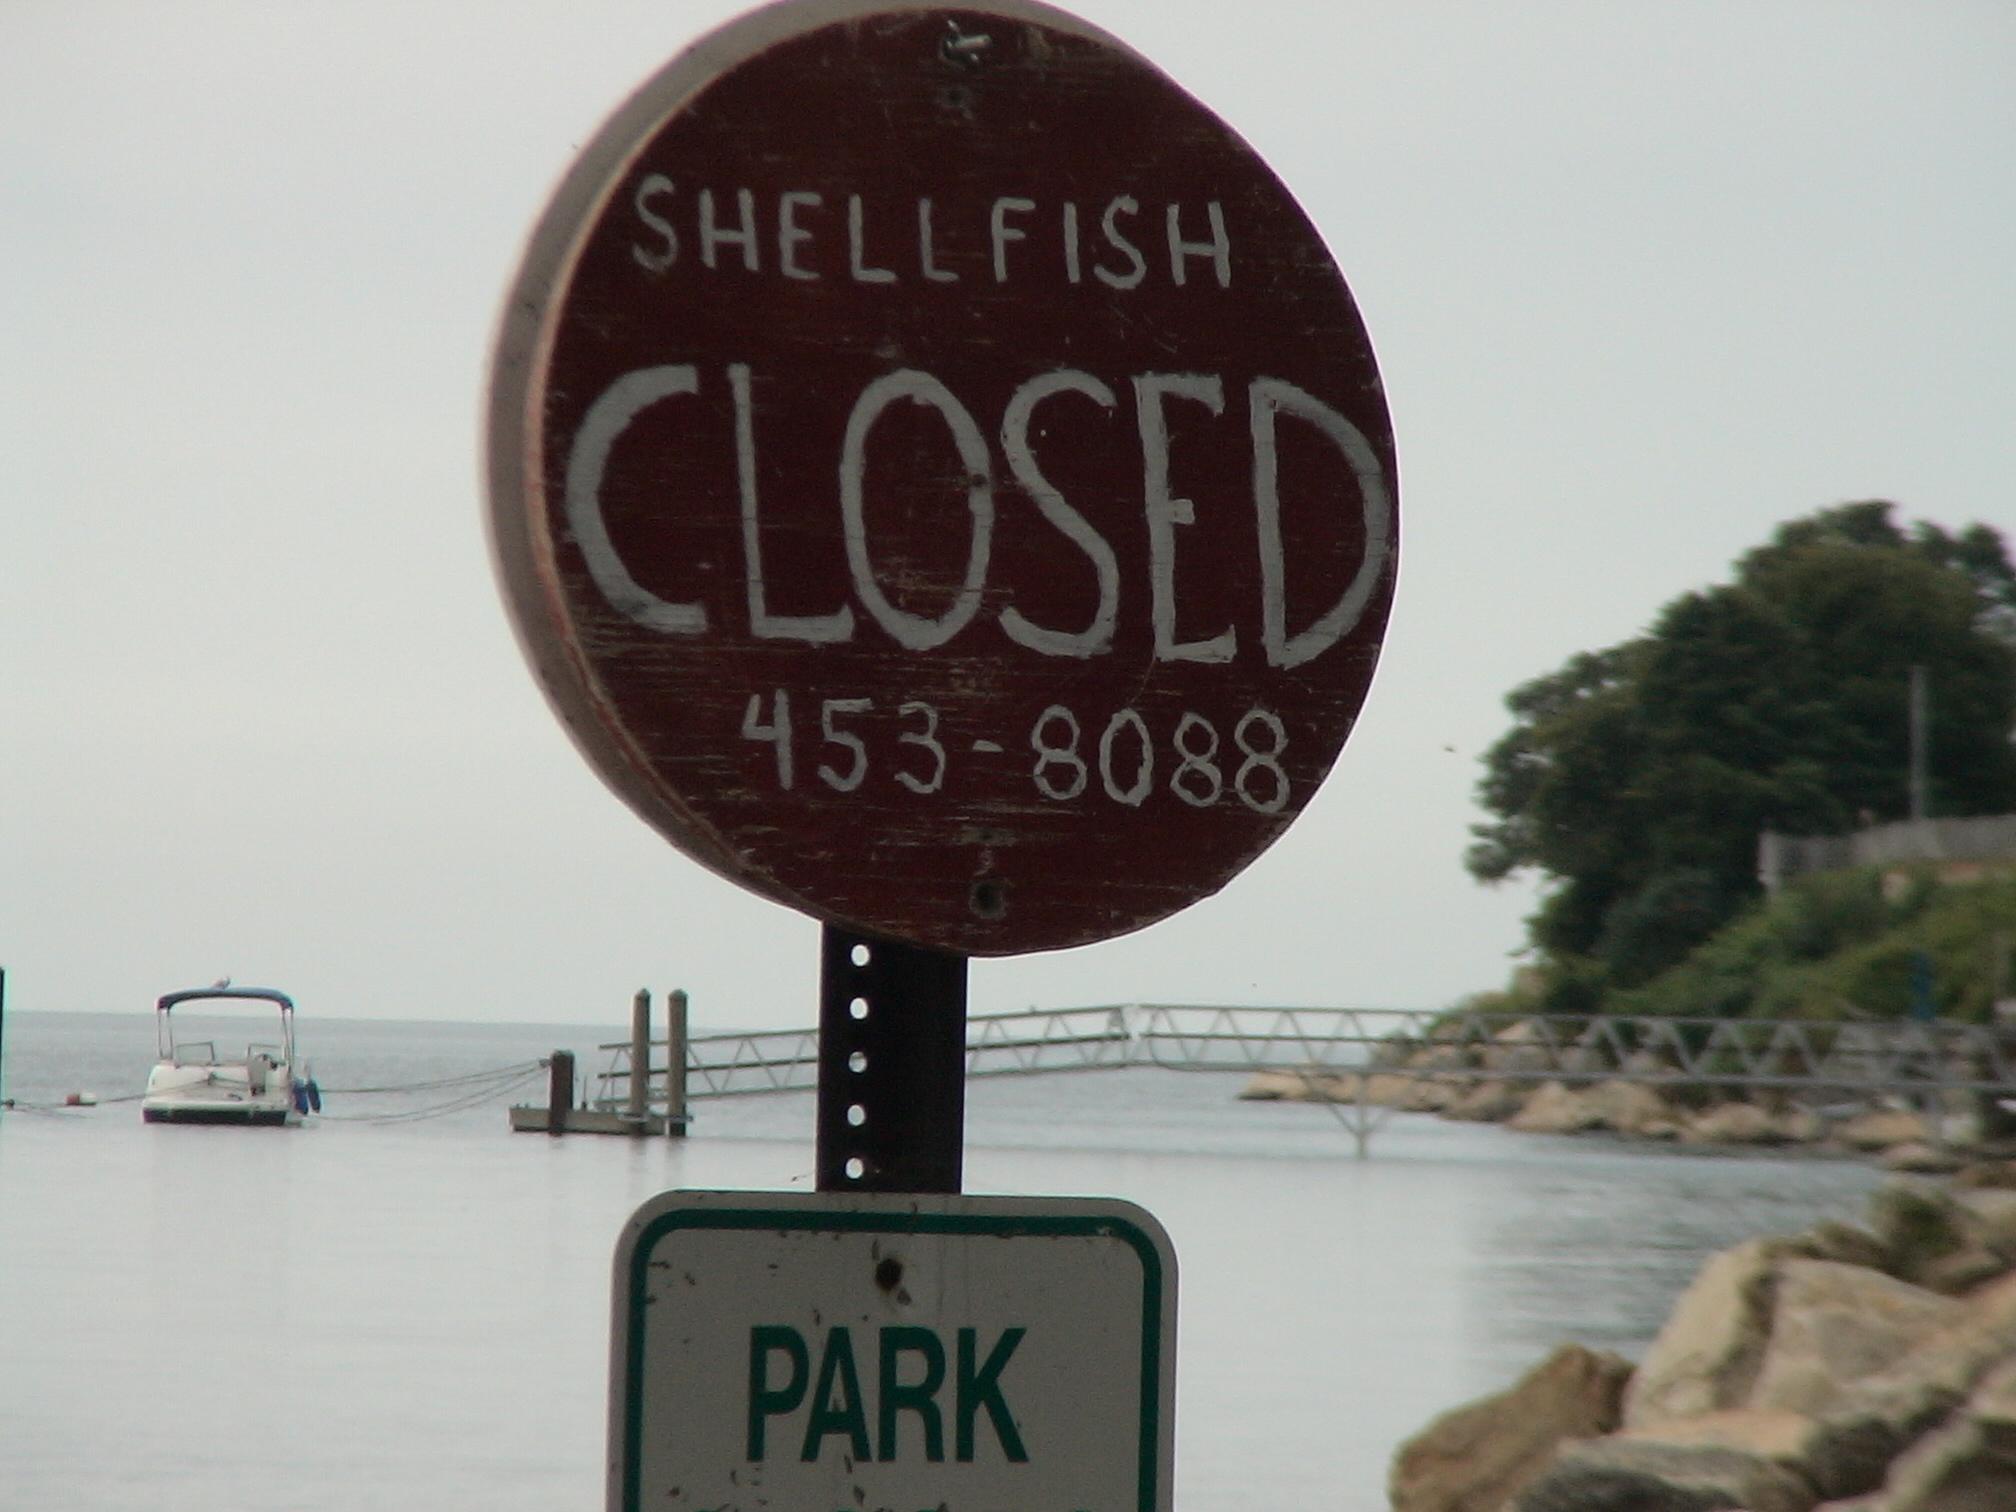 Shellfishing Closed Sign